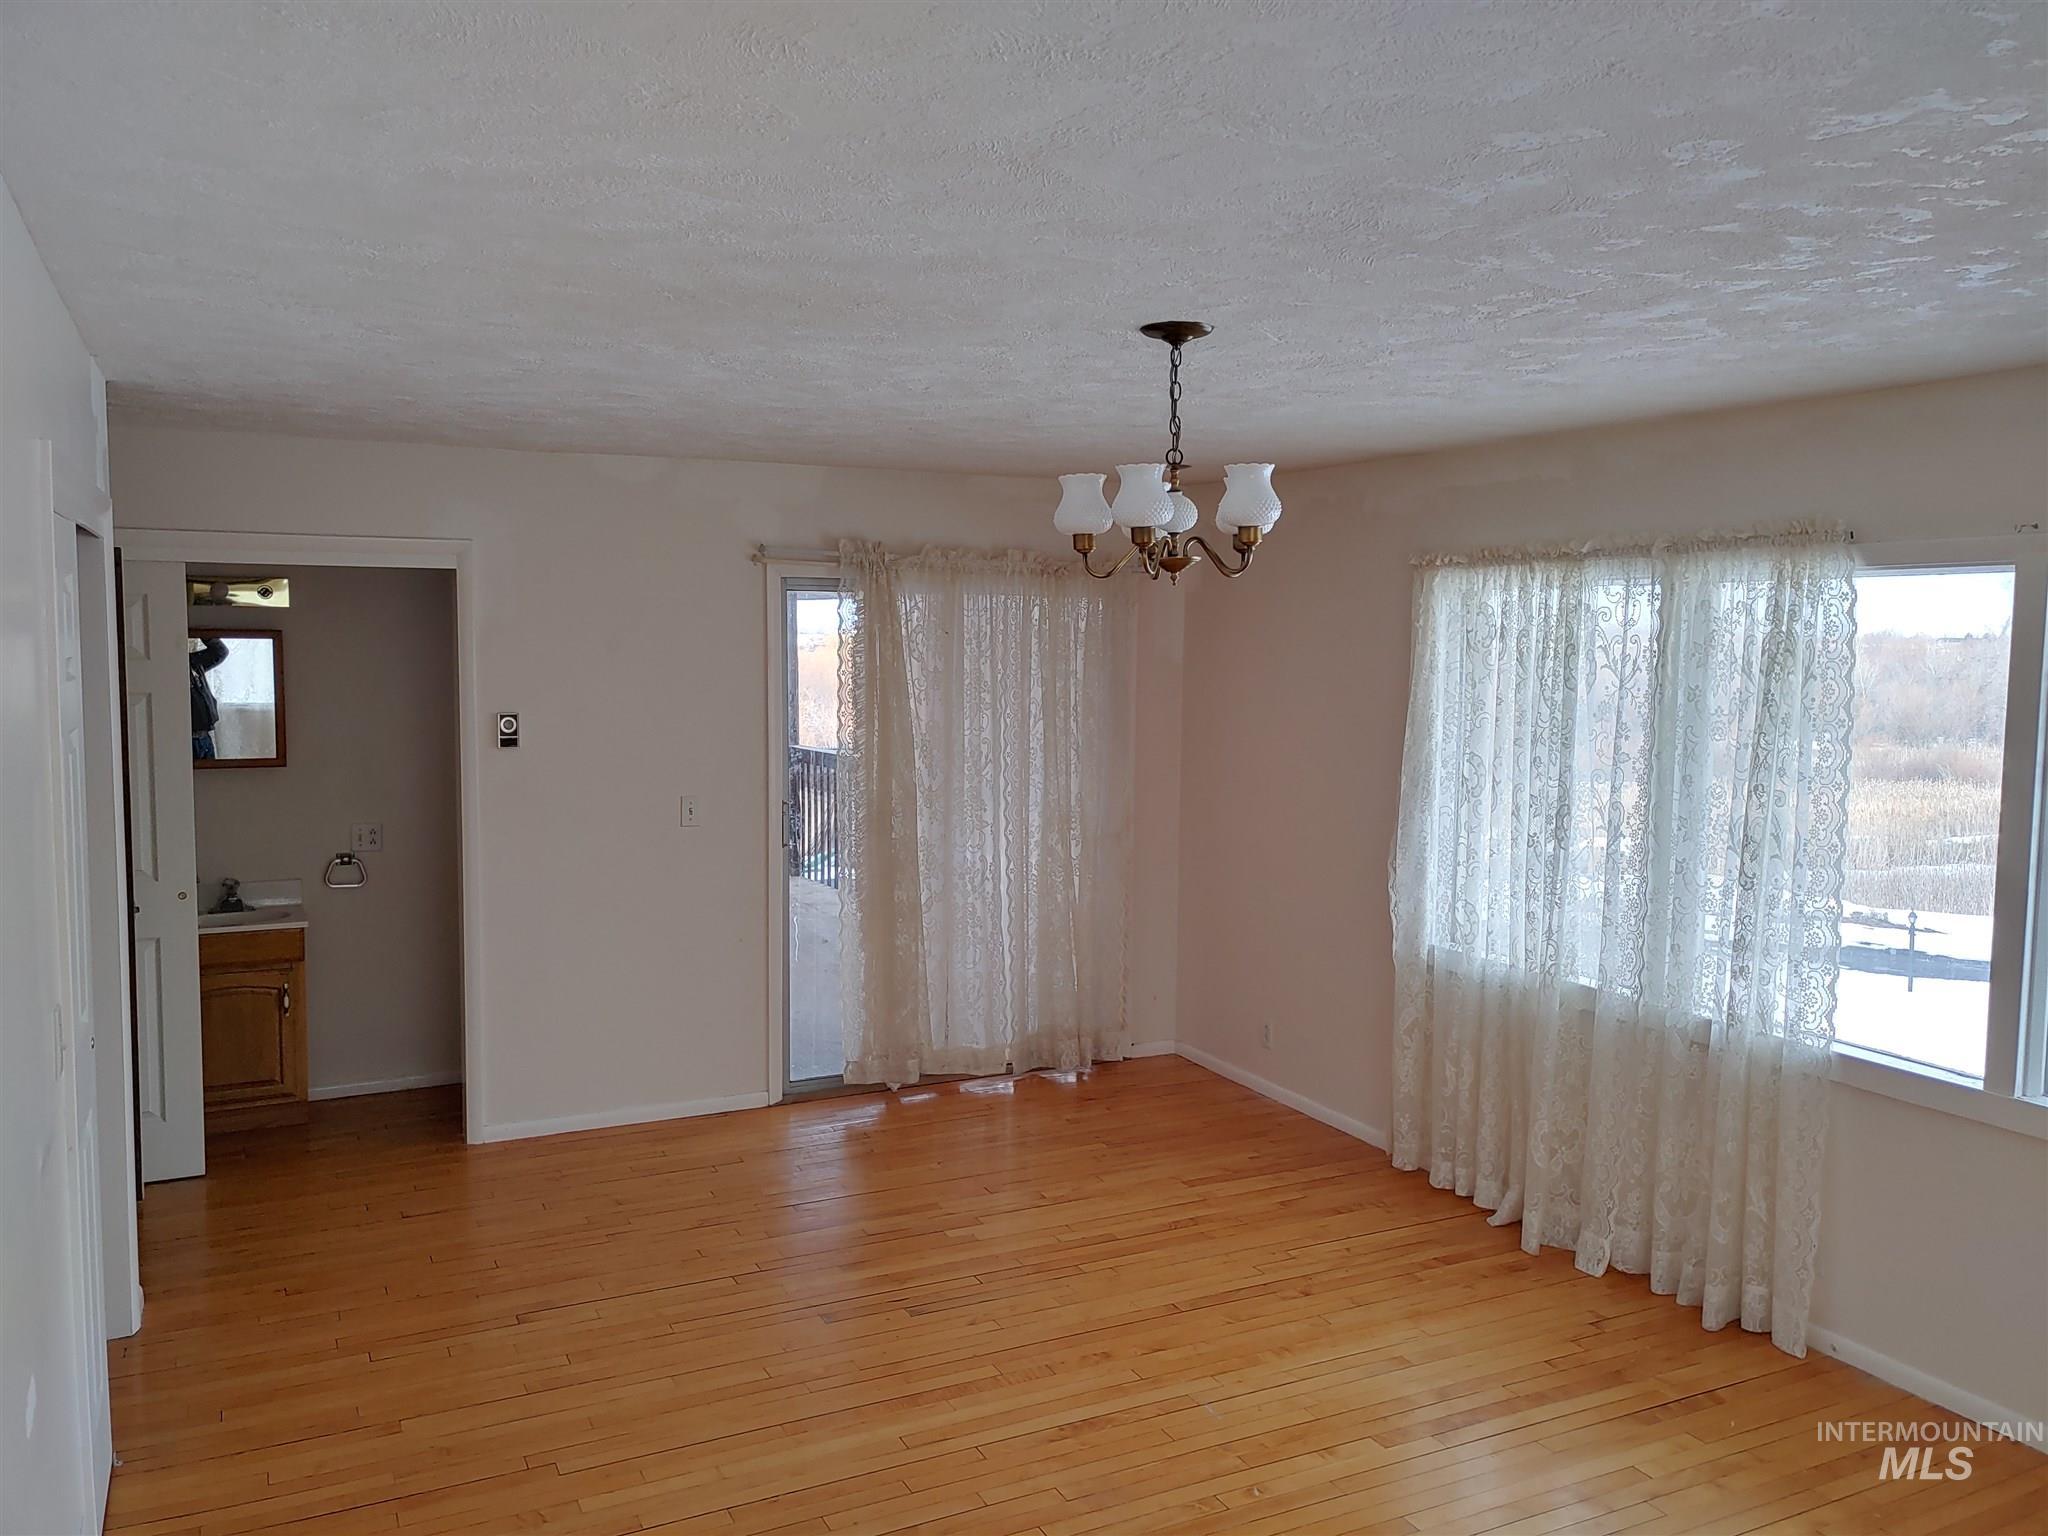 4980 W 4000 N Property Photo 12